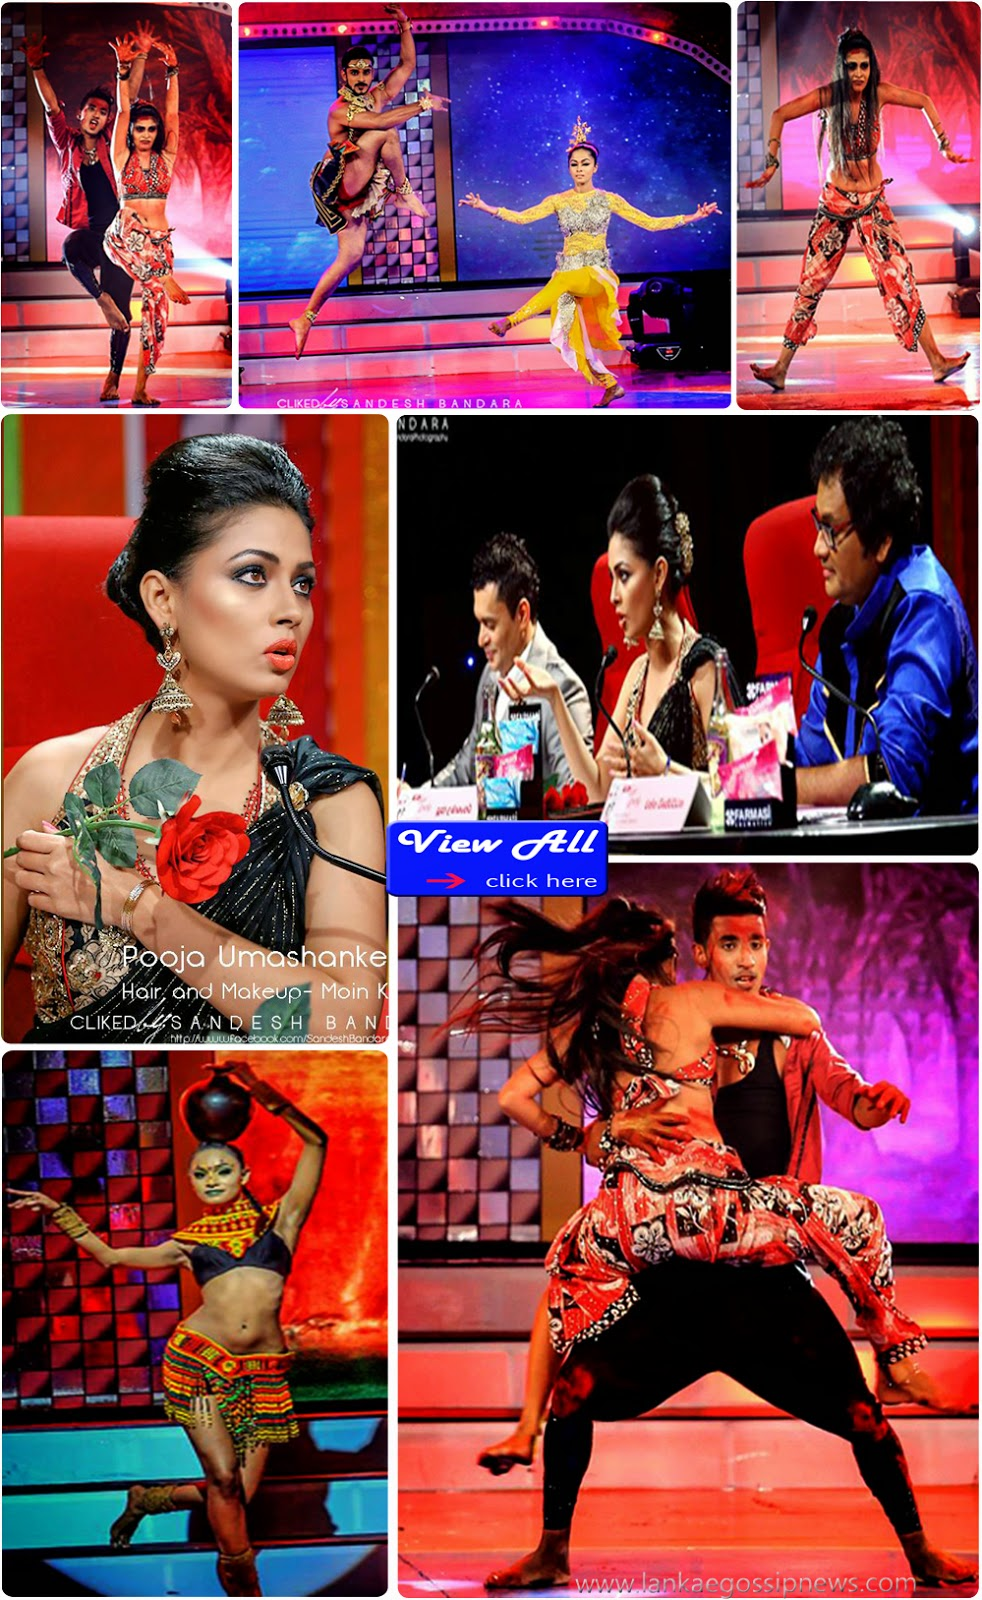 http://photos.lankaegossipnews.com/2014/10/city-of-dance-season-05-episode-10.html